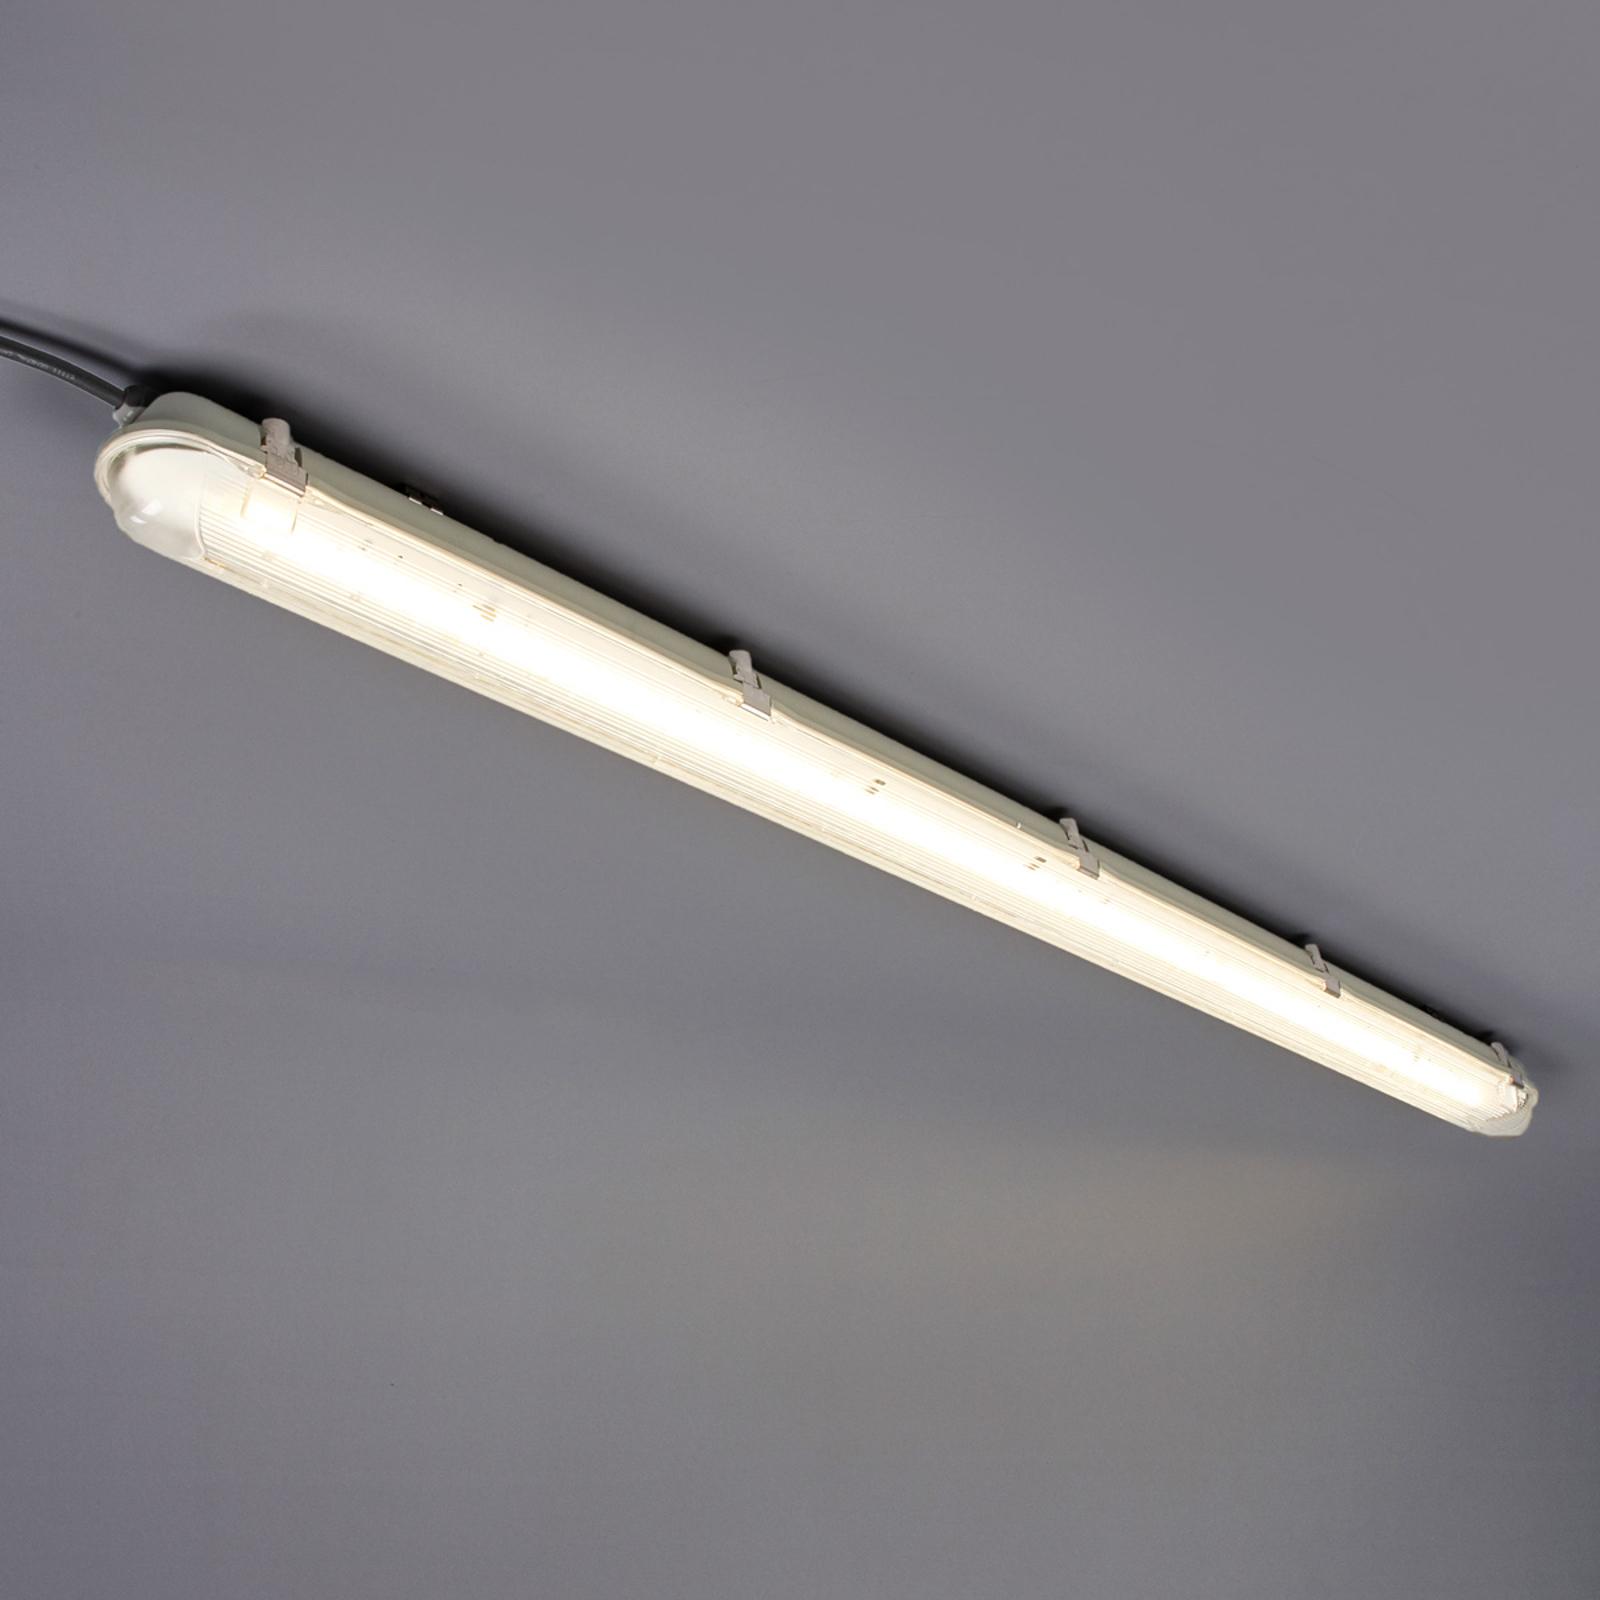 LED-våtrumslampa, 34 W